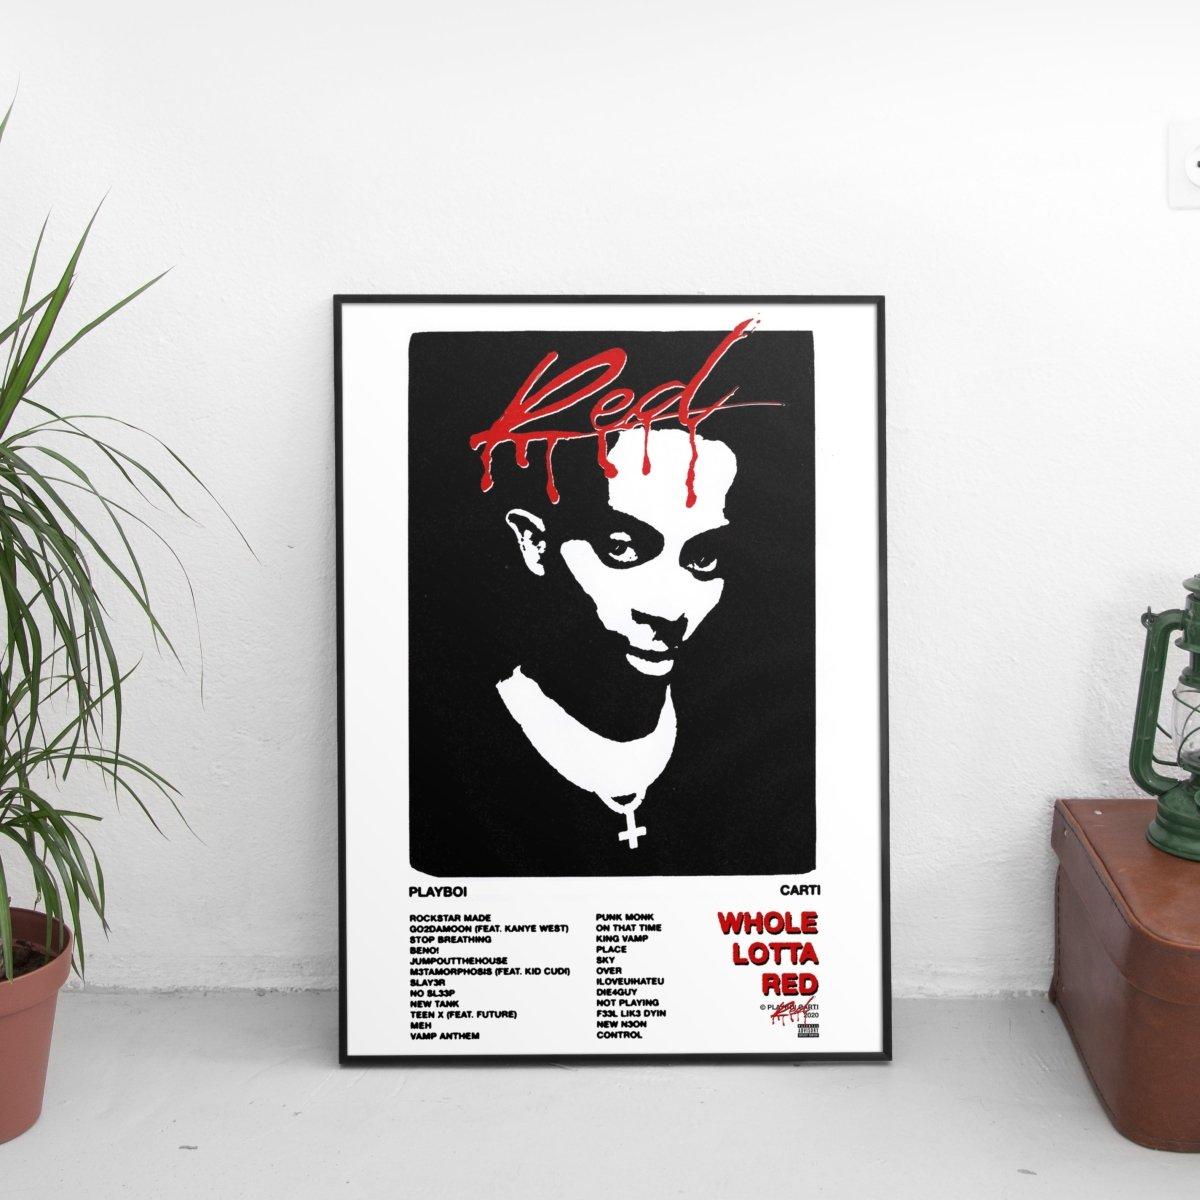 Playboi Carti - Whole Lotta Red Tracklist Poster